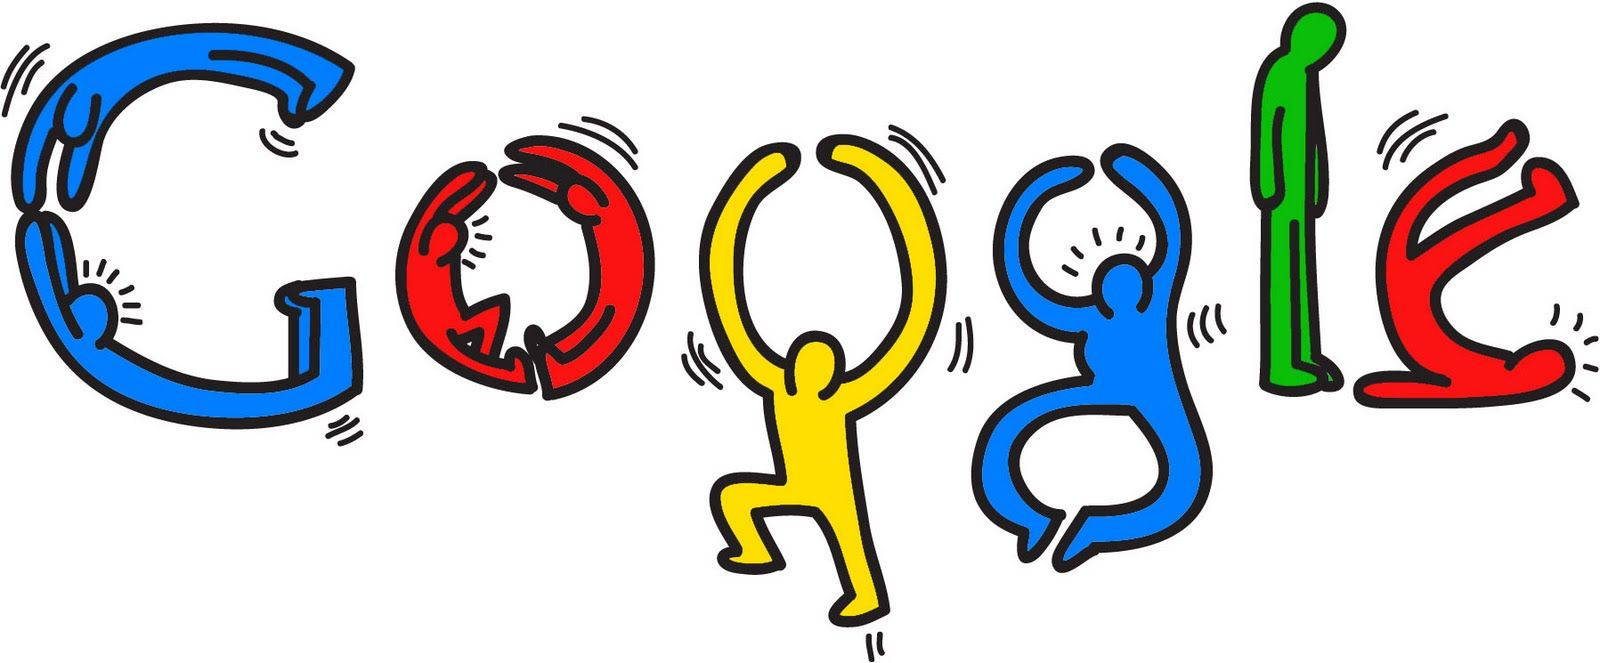 keith haring - Google 검색